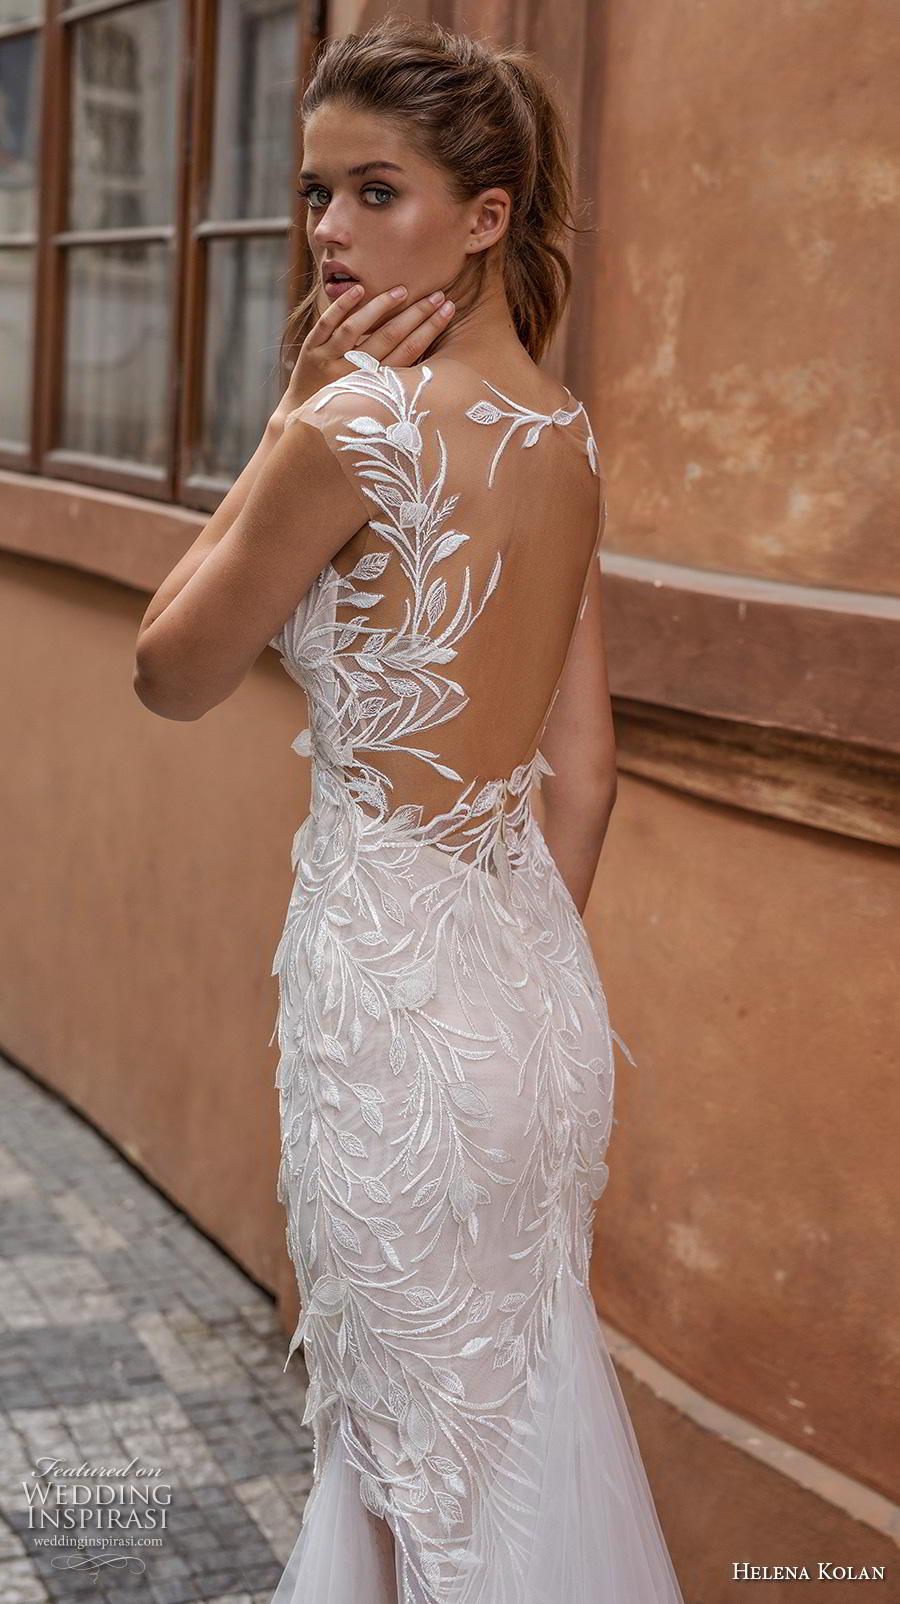 helena kolan 2019 bridal cap sleeves deep plunging sweetheart neckline full embellishment elegant sheath fit and flare wedding dress sheer back chapel train (12) zbv